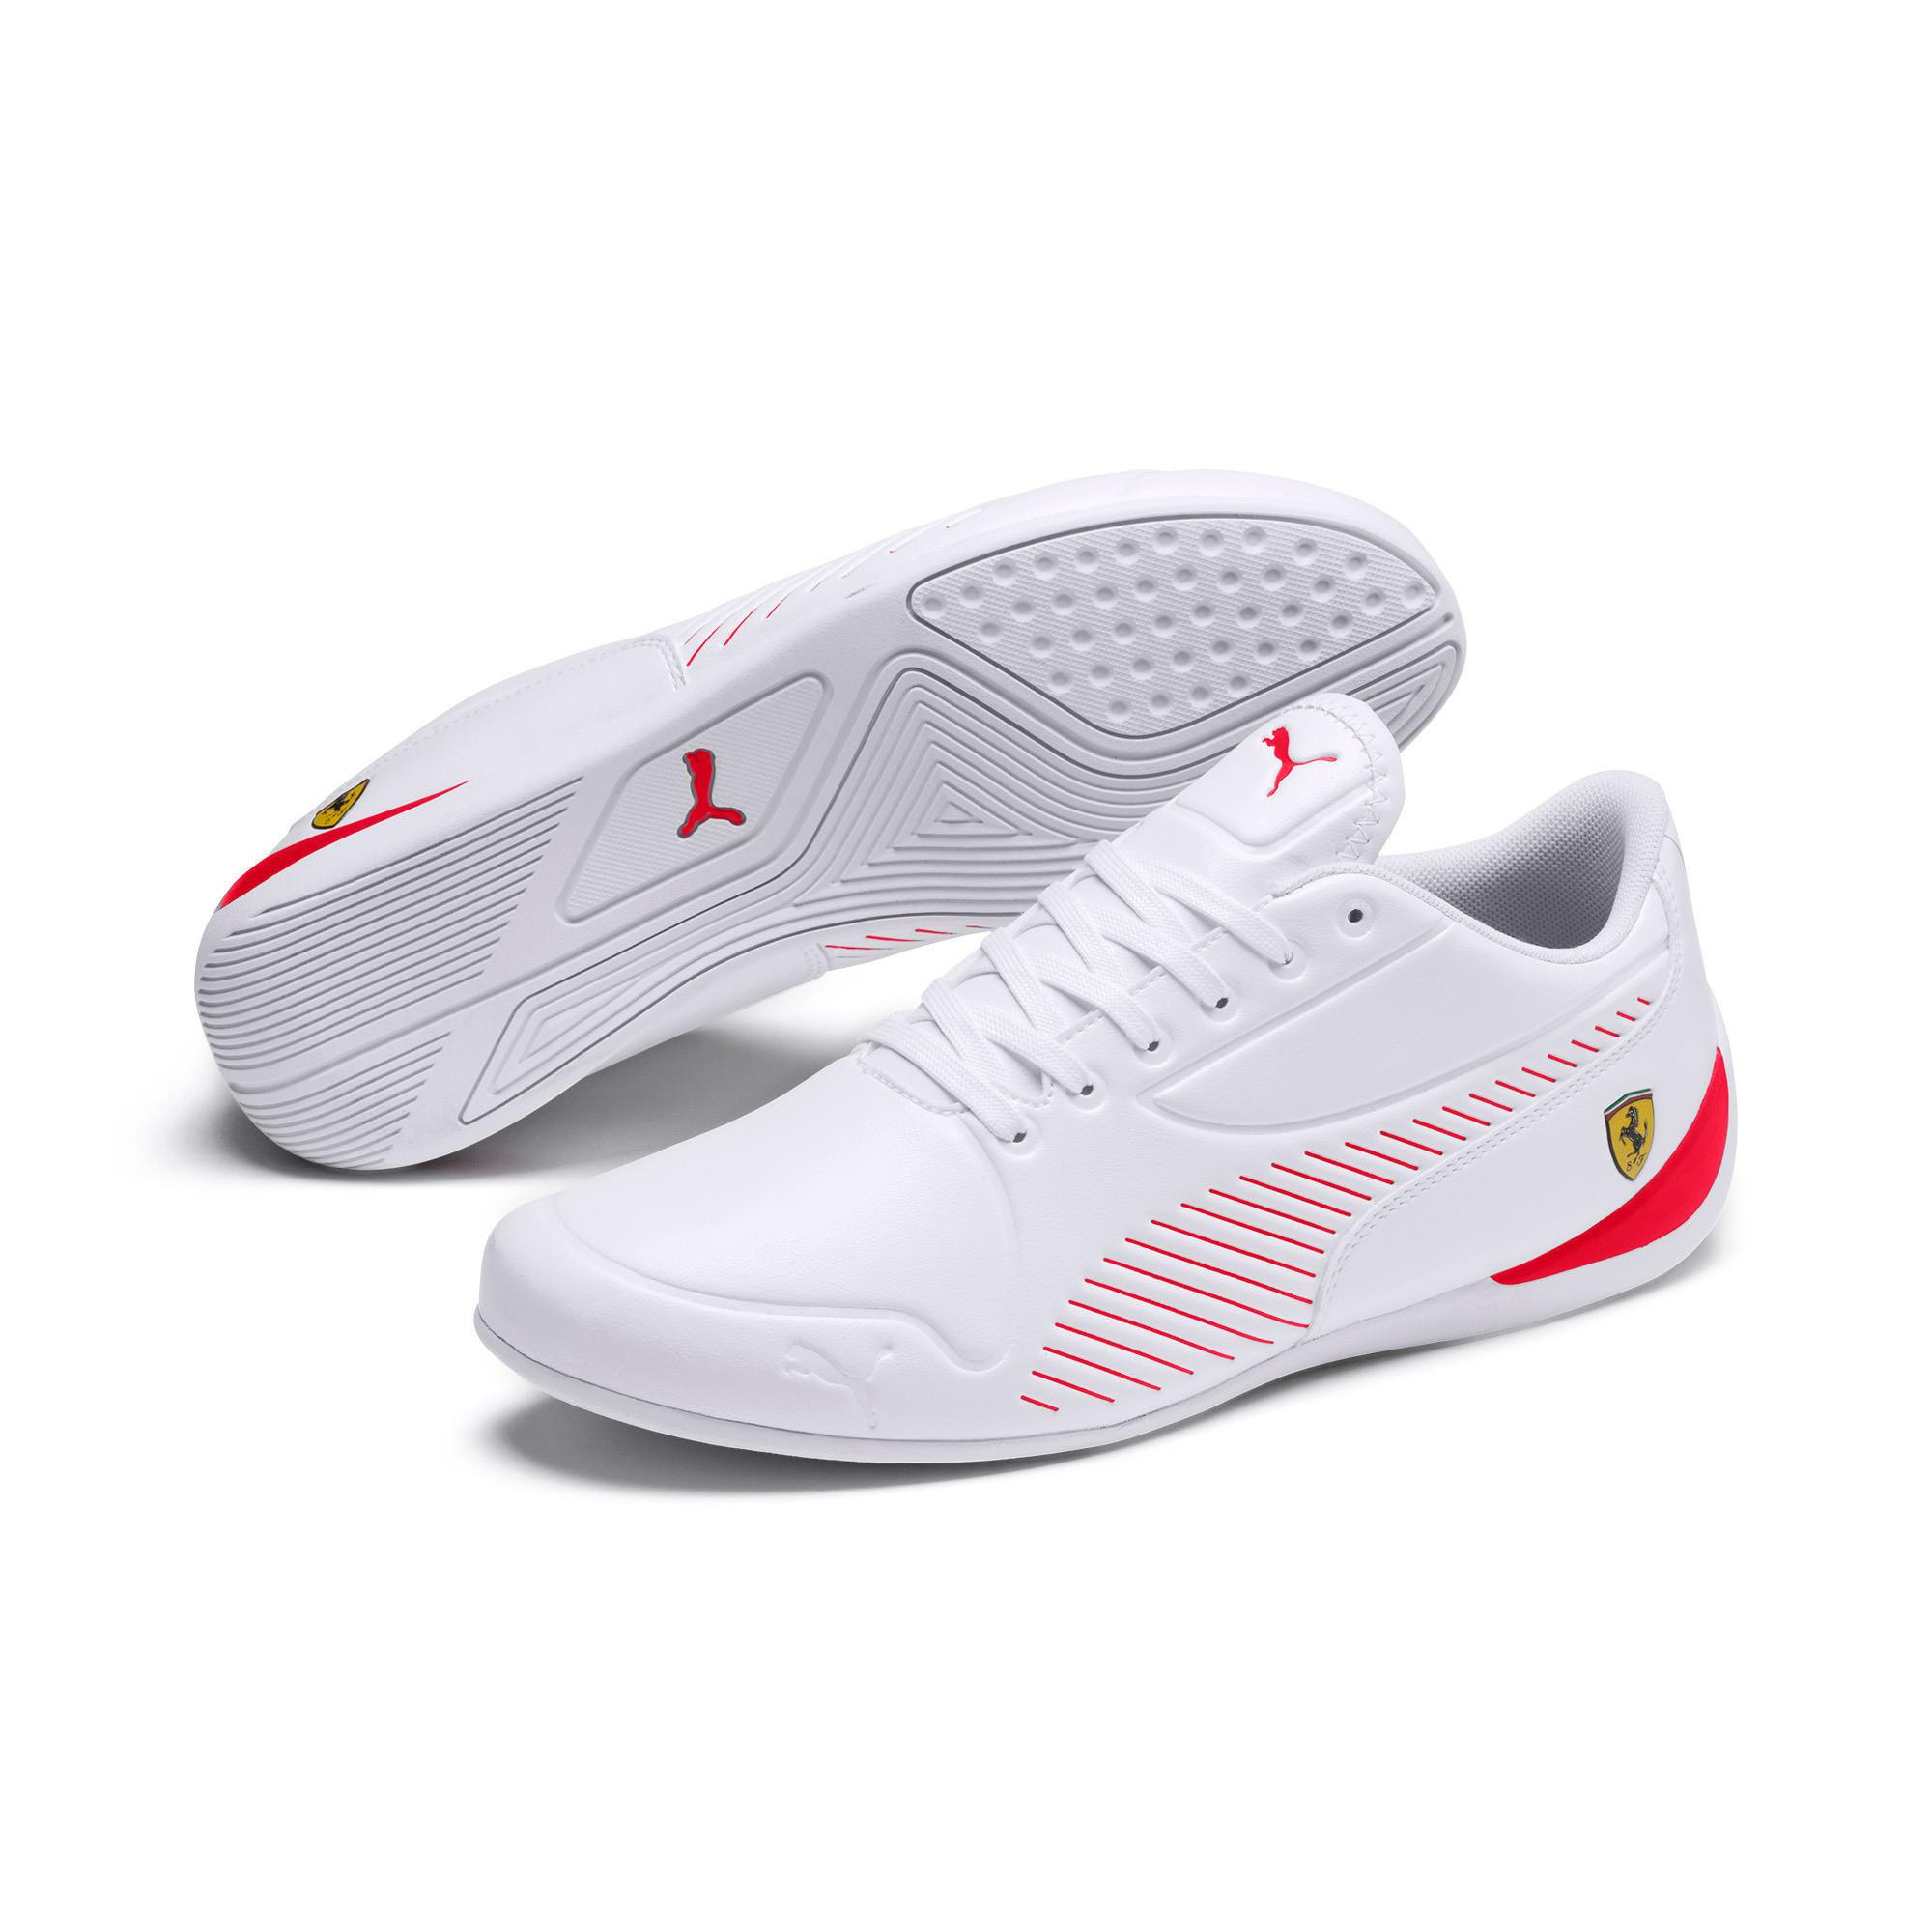 Thumbnail 2 of Scuderia Ferrari Drift Cat 7S Ultra Men's Shoes, Puma White-Rosso Corsa, medium